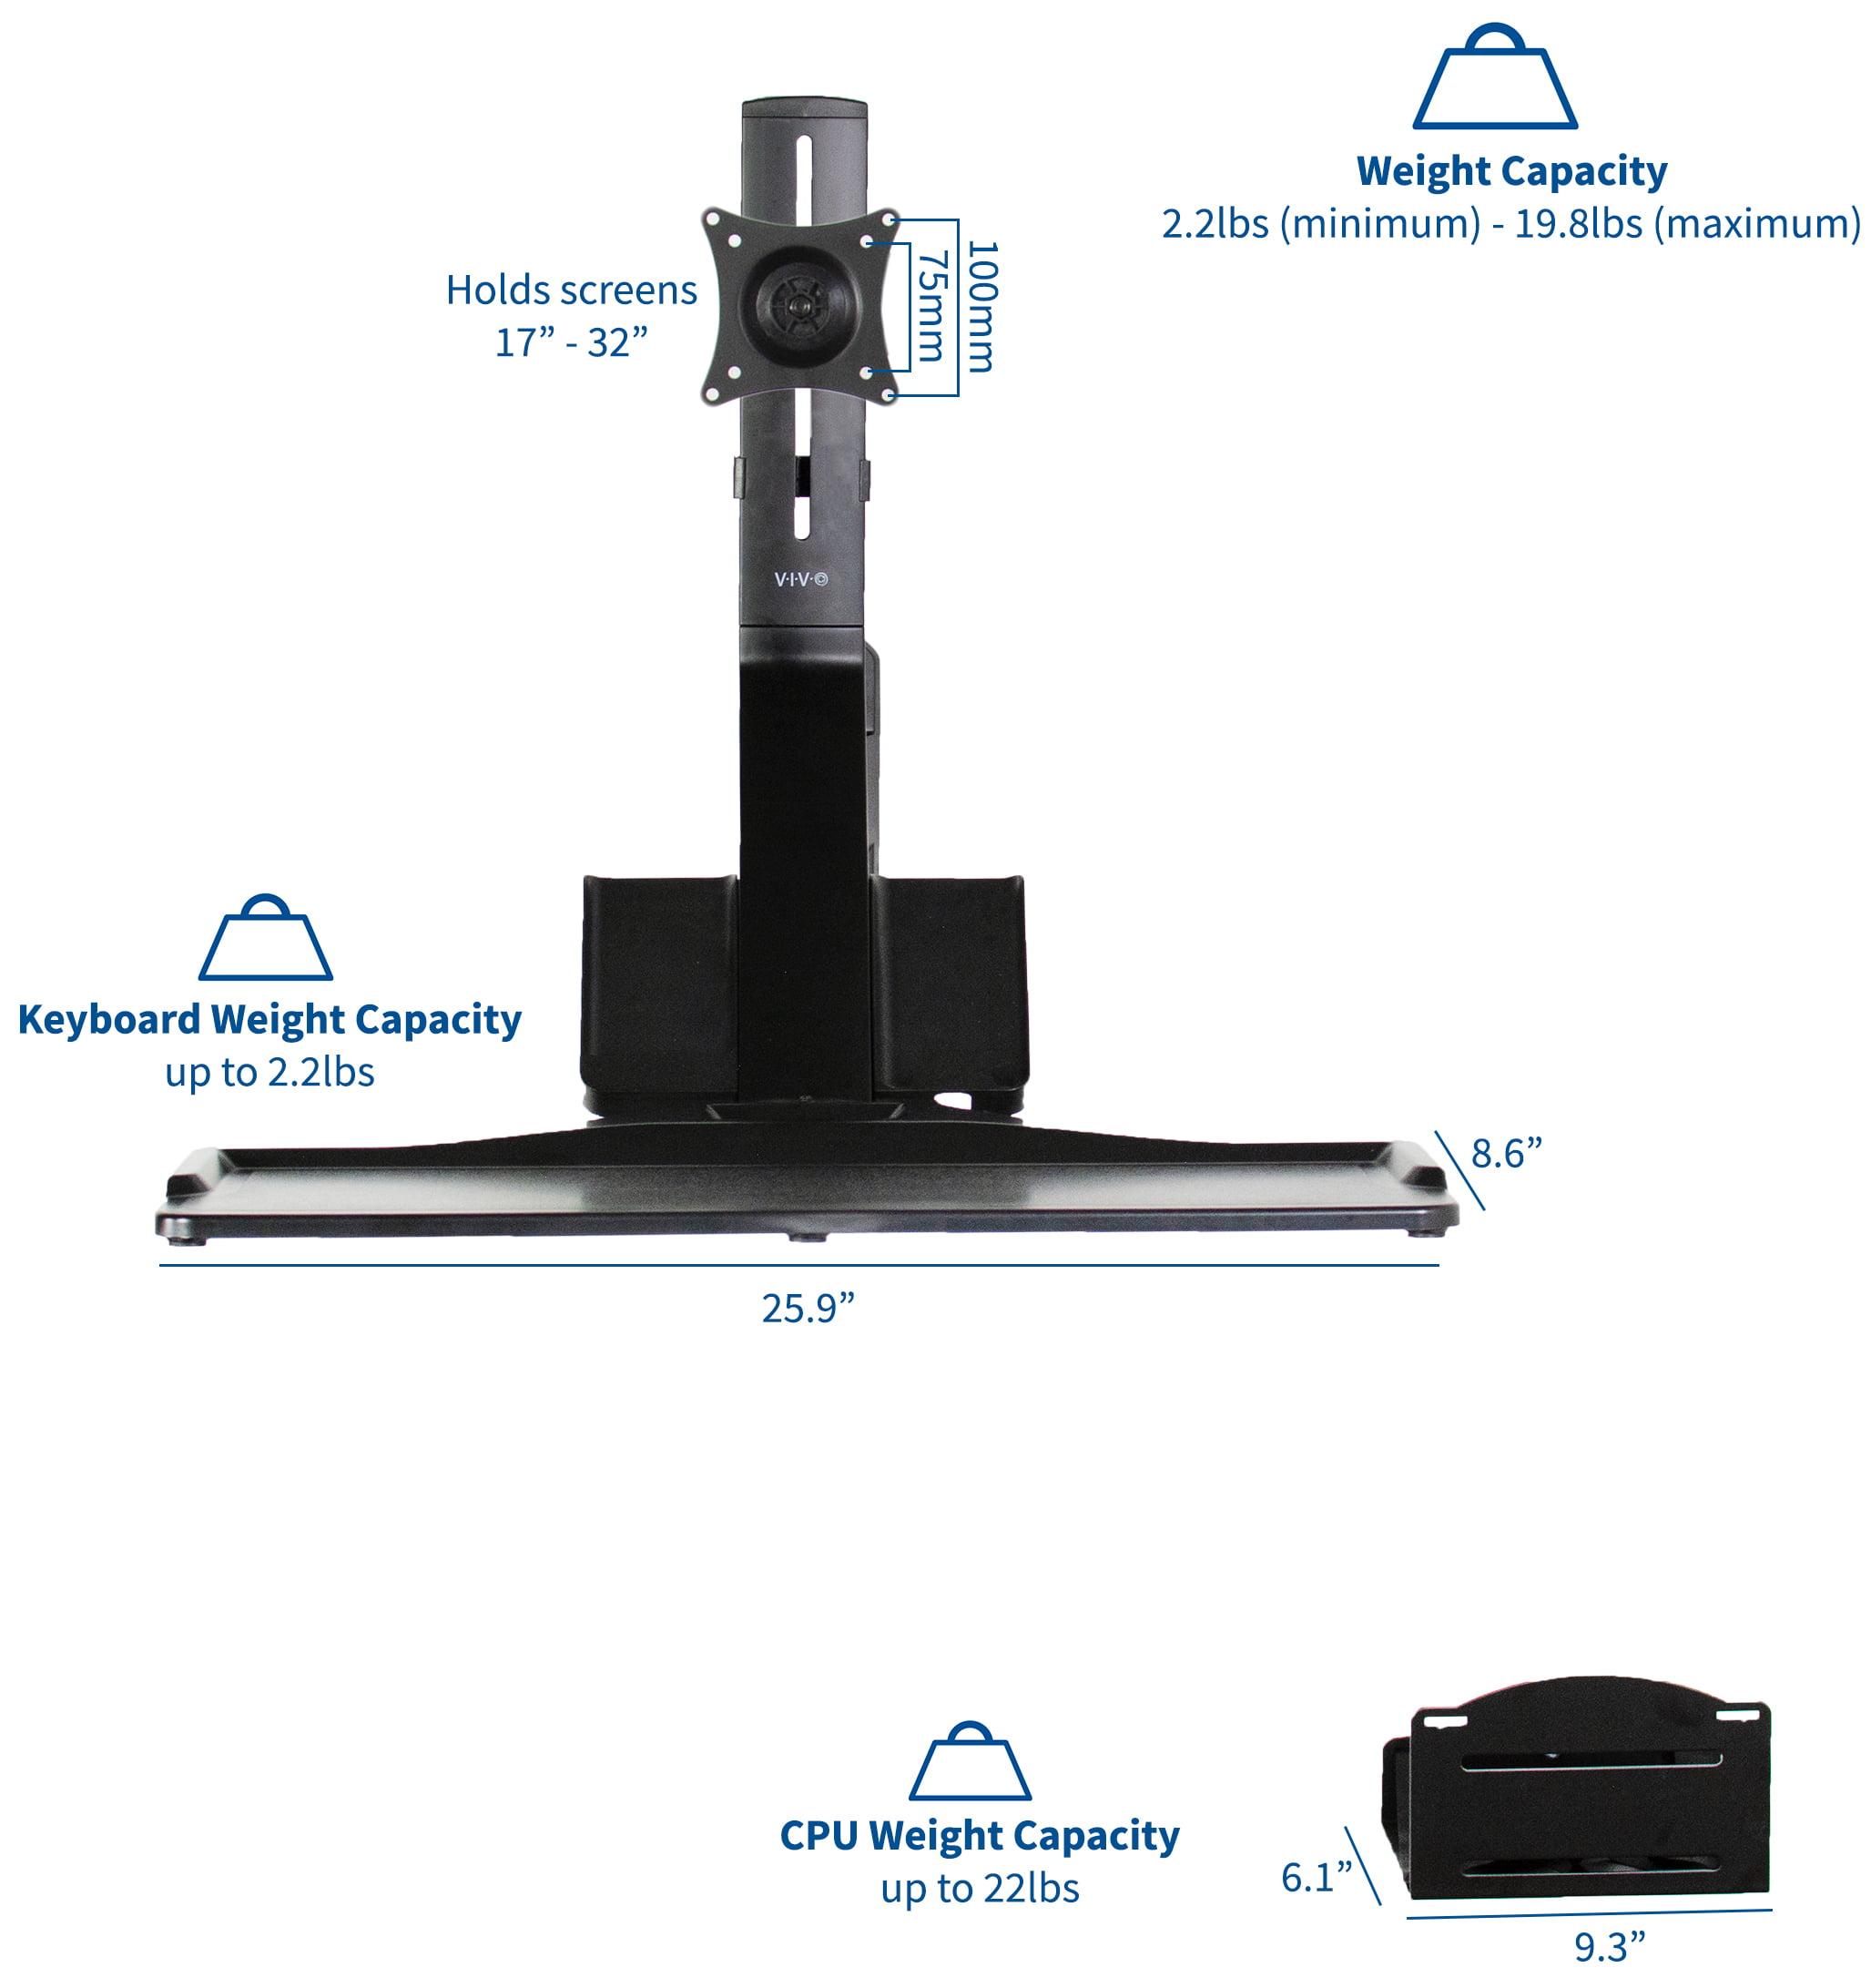 VIVO Sit-Stand Wall Mount Counterbalance Adjustable Monitor Keyboard Workstation